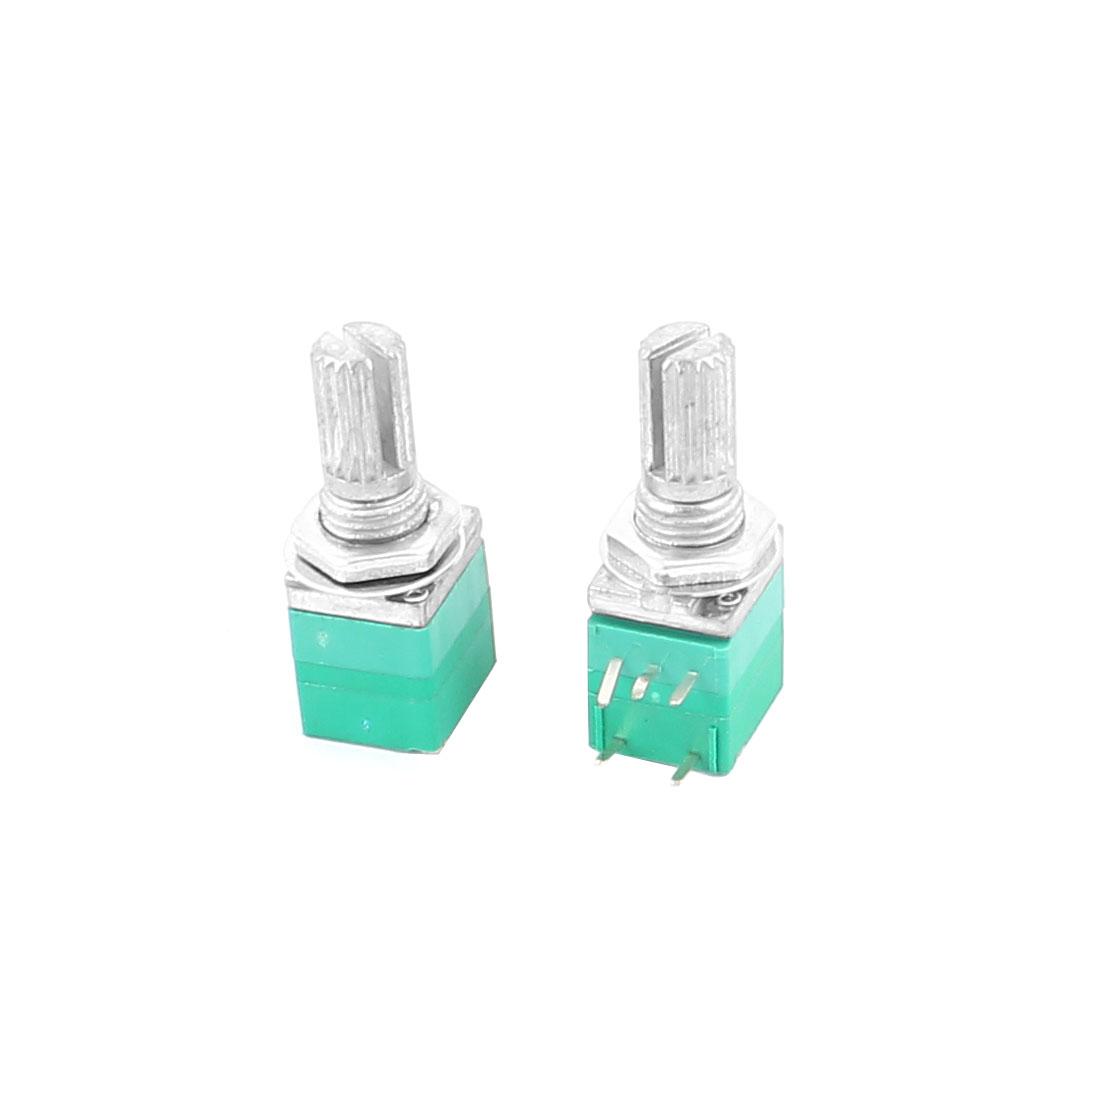 2pcs B50K 50K Ohm 7mm Thread 6mm Knurled Shaft 5Pins Green Adjustable Rotary Potentiometer w Switch